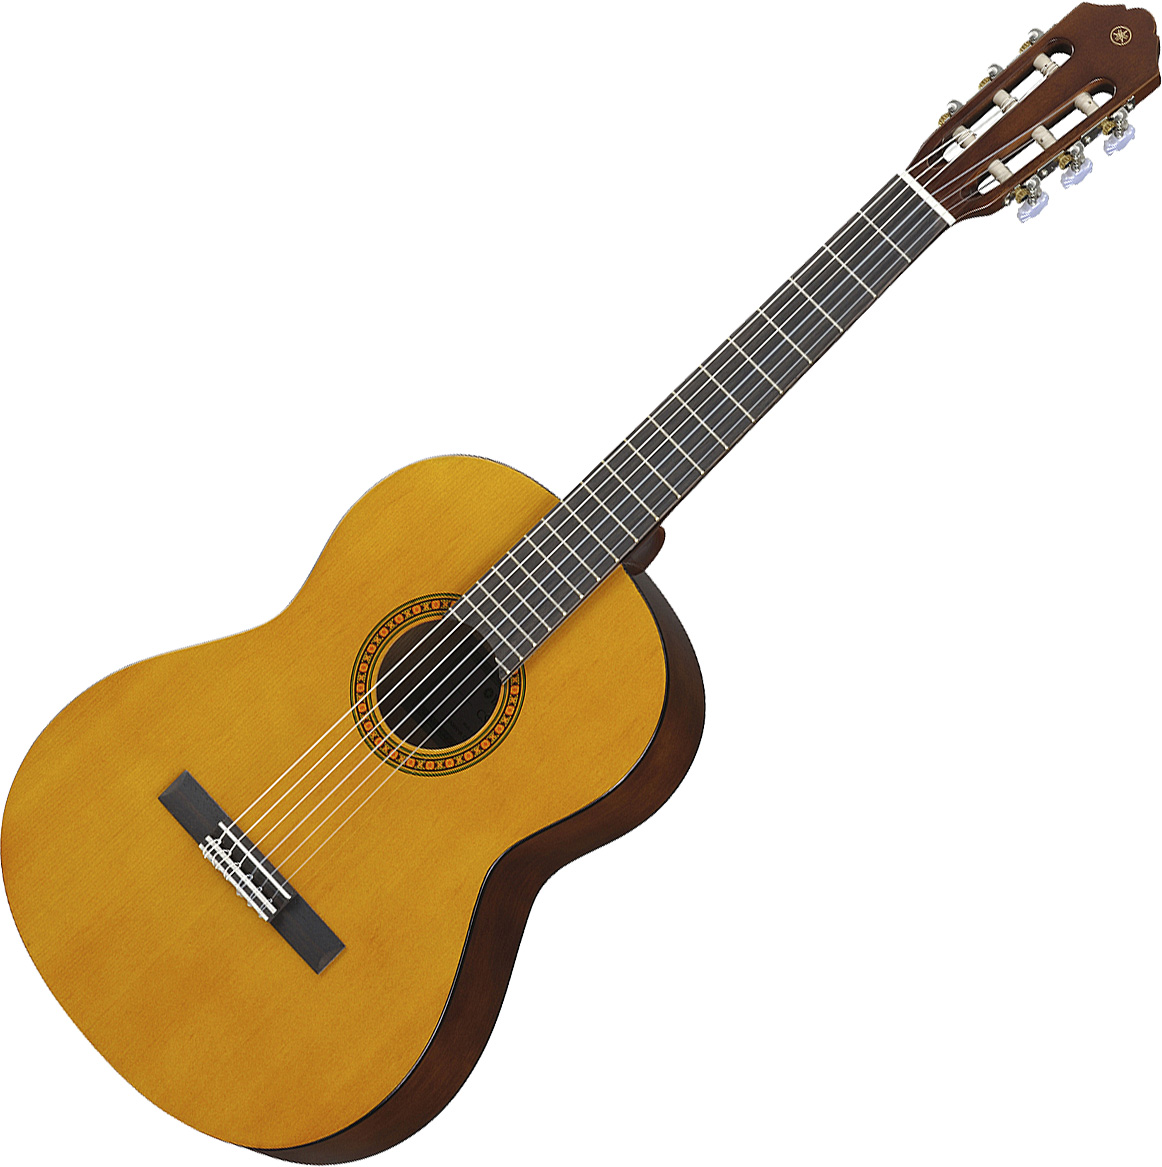 Yamaha CS40 II - natural Guitare classique format 3/4